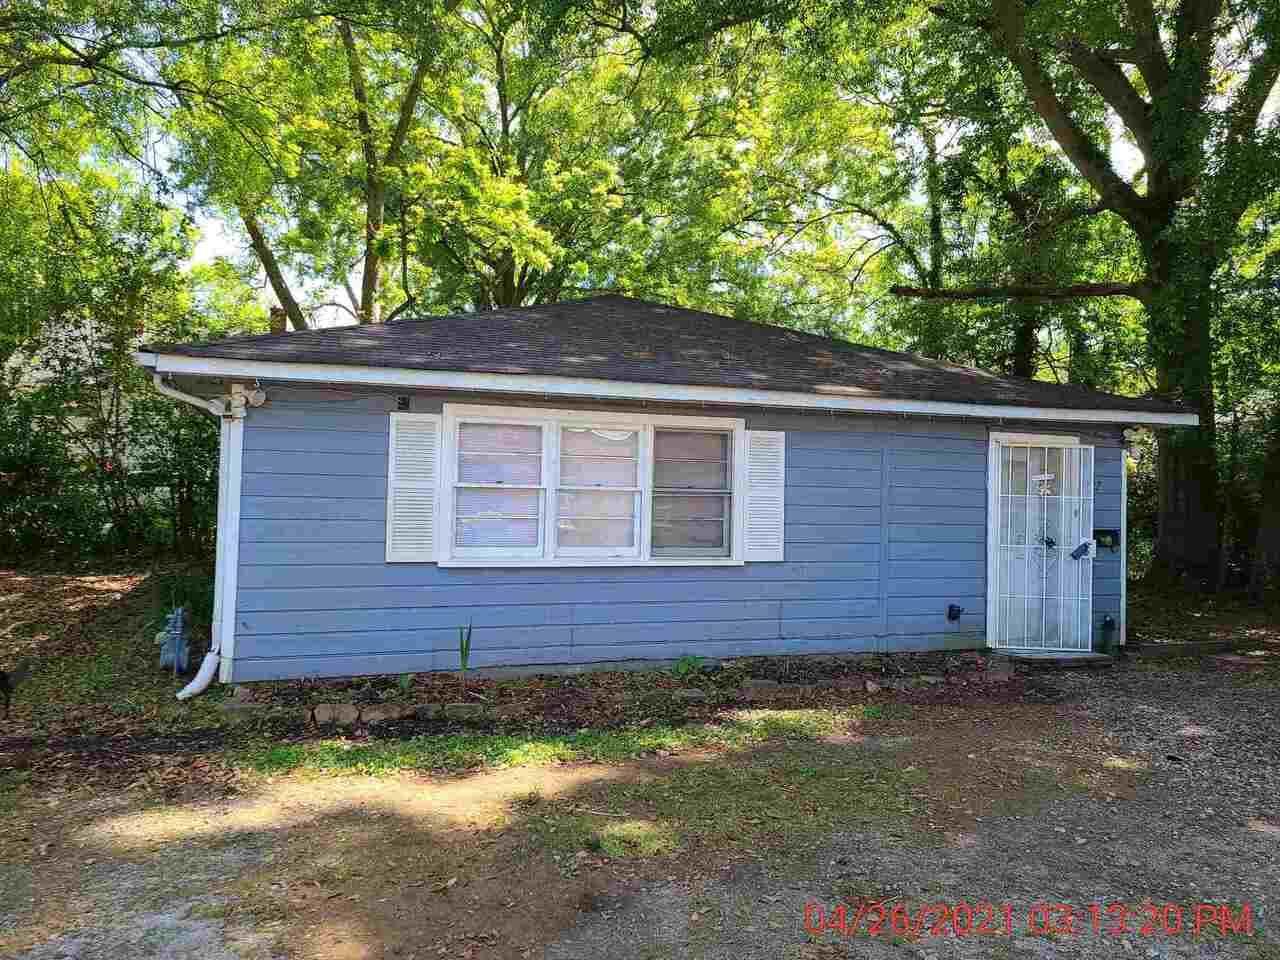 722 W Slaton Ave, Griffin, GA 30223 - #: 8967732